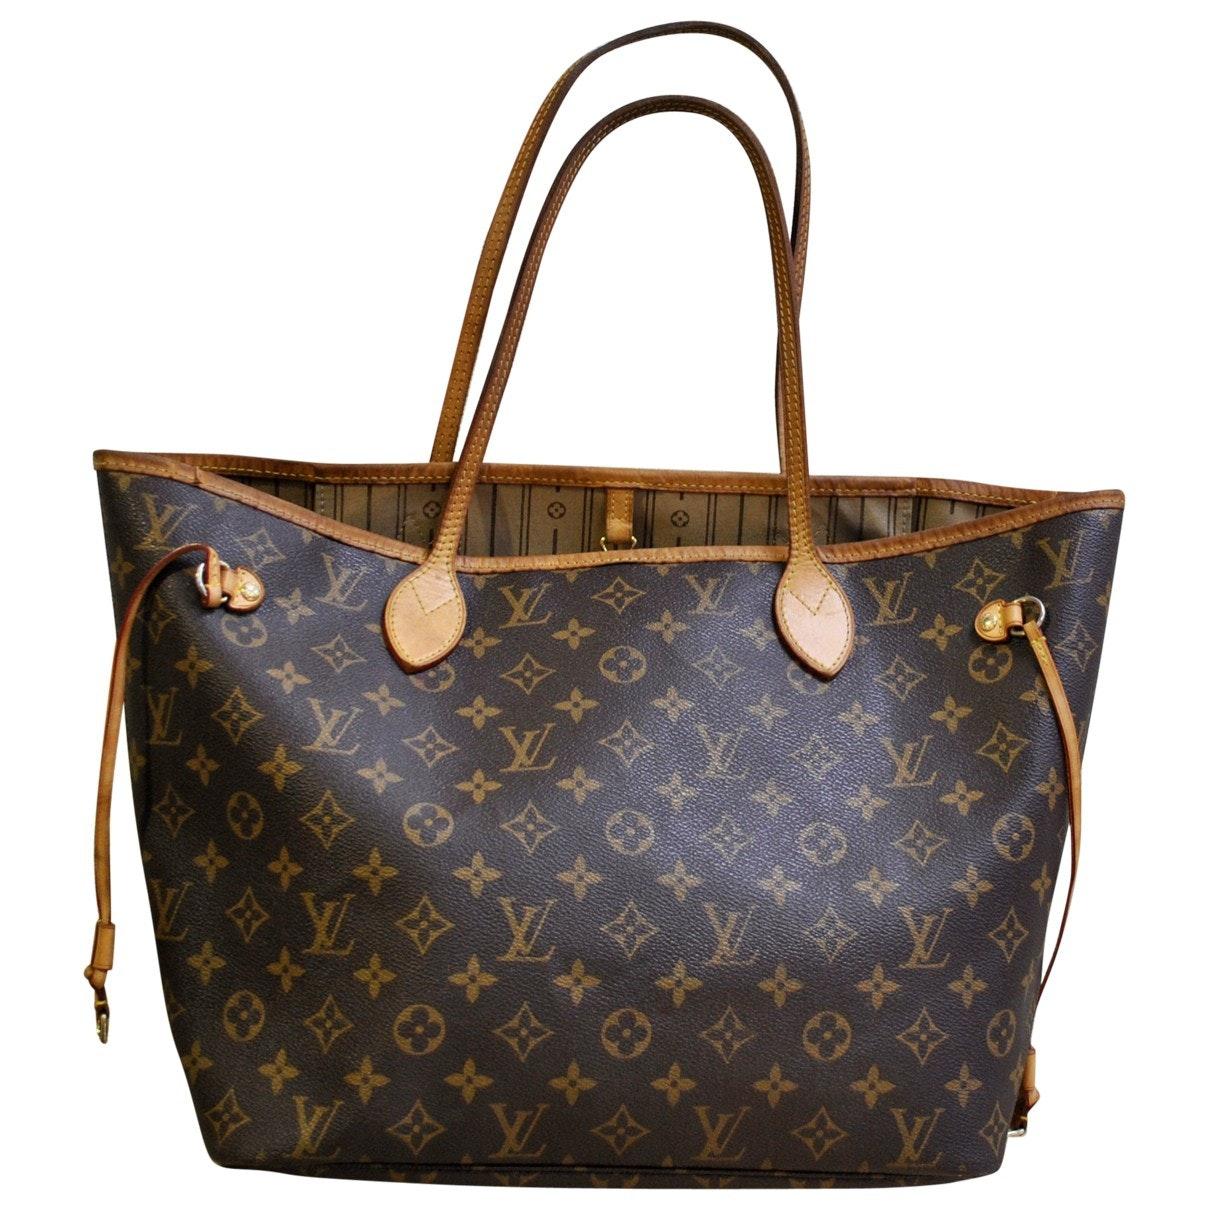 Louis Vuitton. Neverfull,, geanta de lux, designer bag,